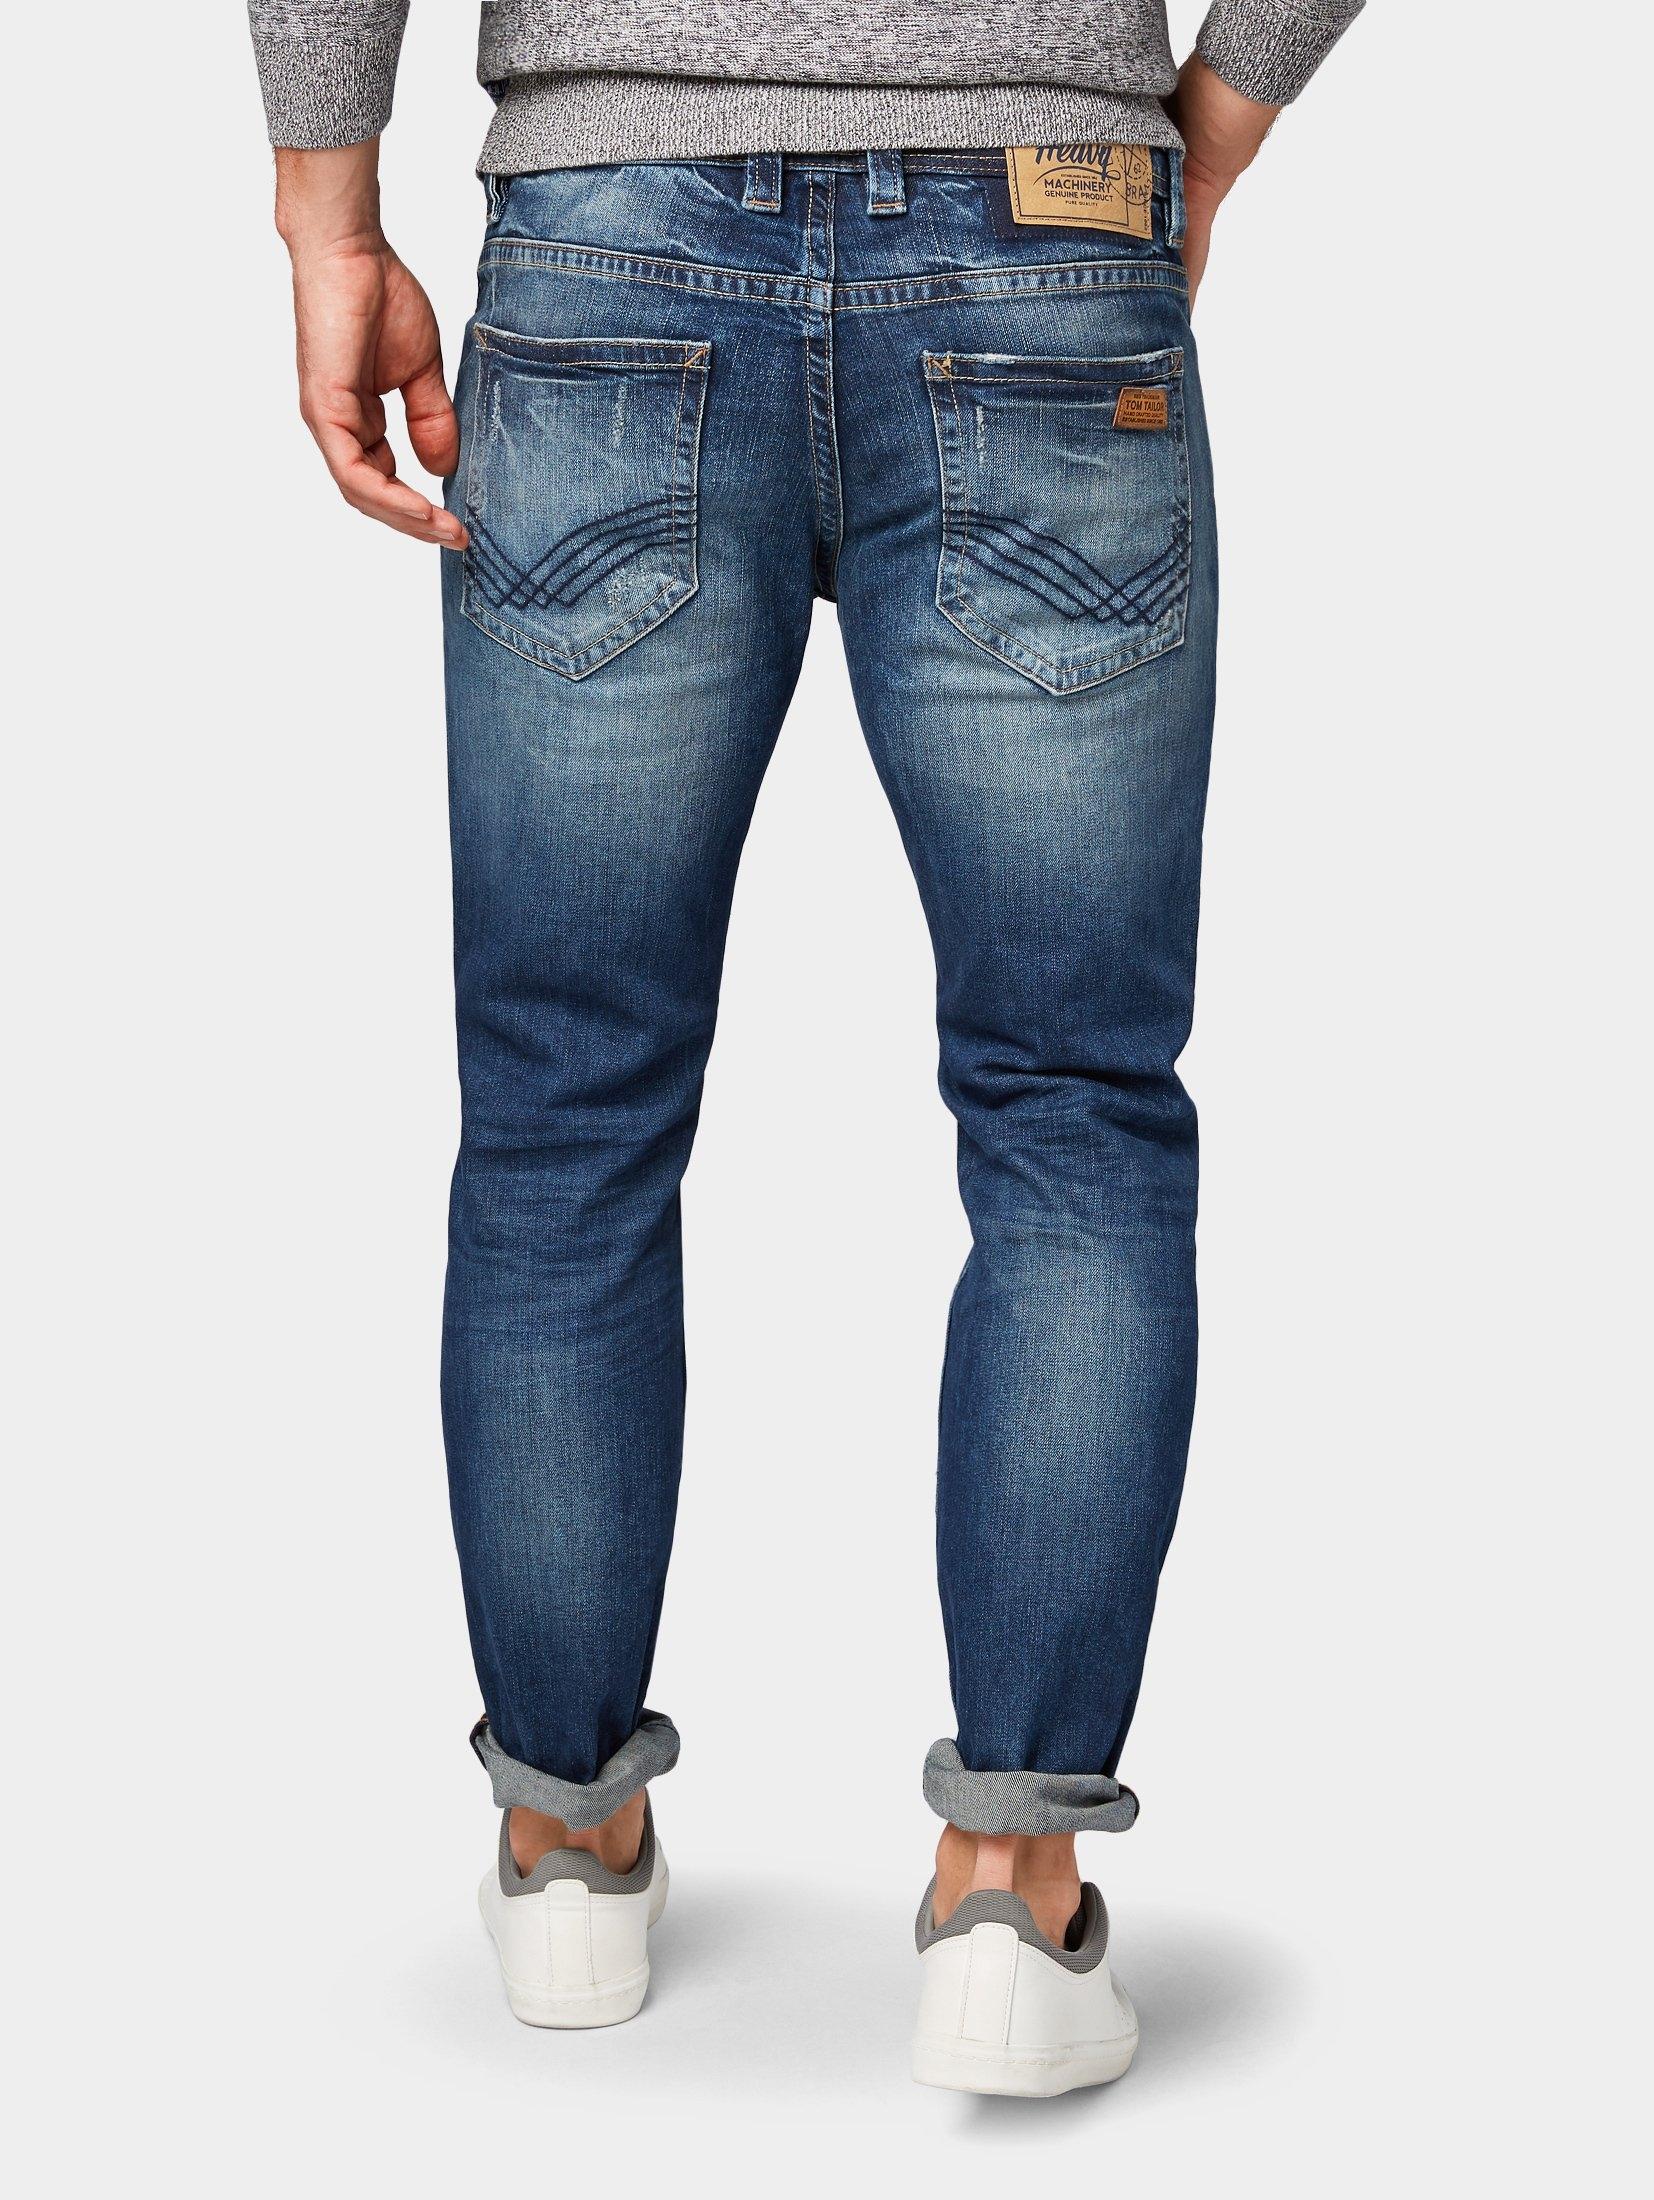 Fit Jeans Tailor Tom Jeansjosh Verkrijgbaar Slim Online Regular CxoEBWdQre